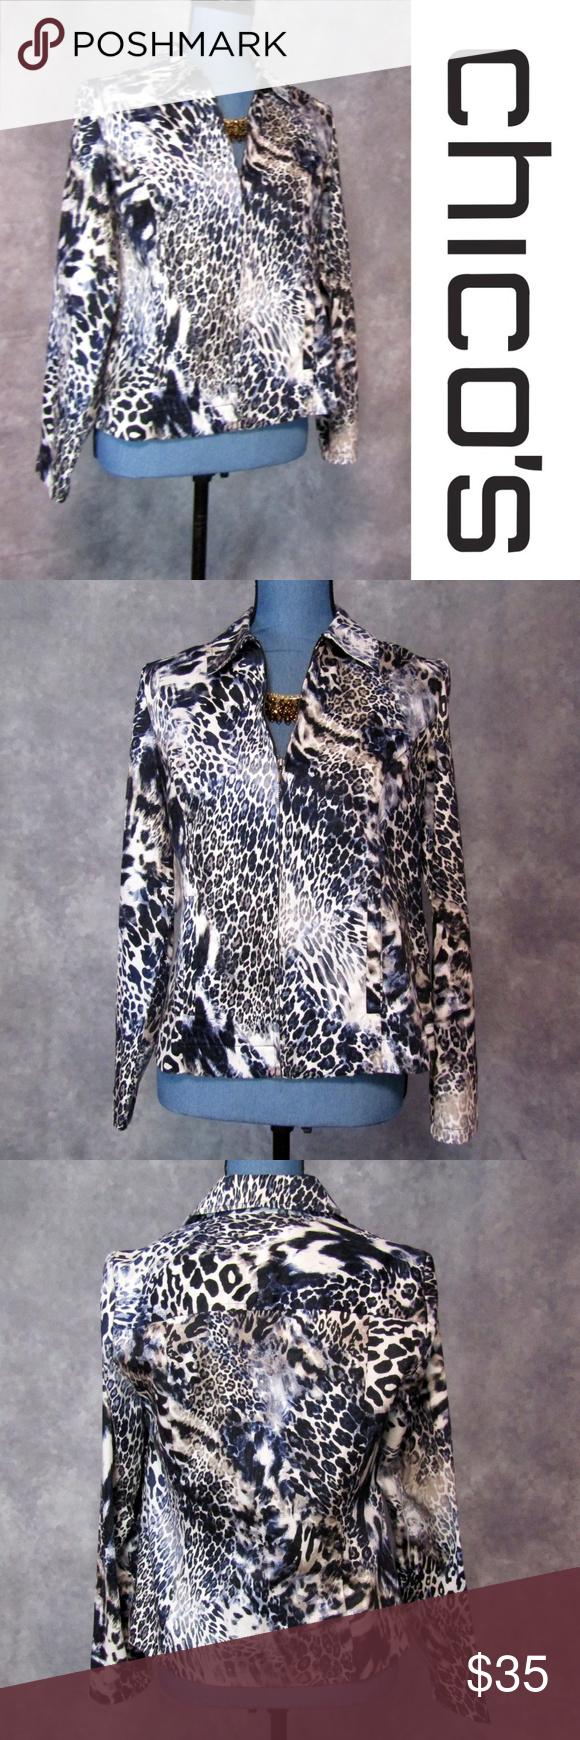 b06ecbfabbd9 Chico's Sz 0 S Blue Leopard Print Zip Front Jacket Chico's Blue Leopard  Animal Print Jacket